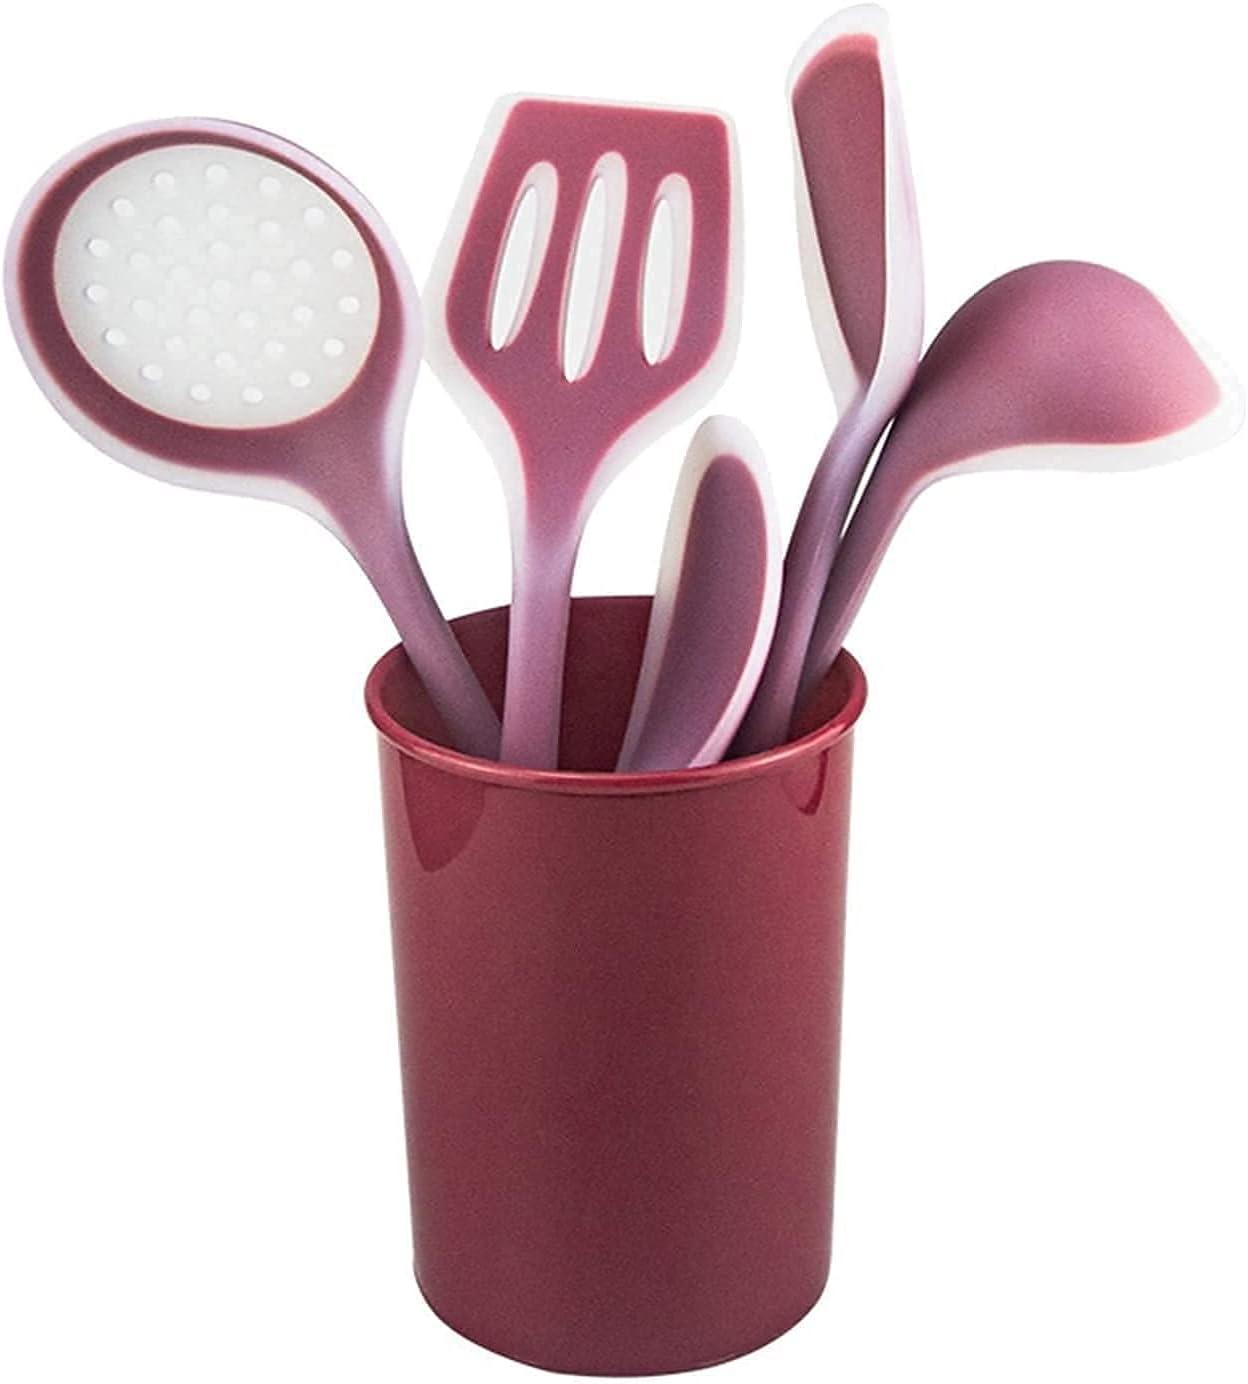 VVlight Kitchen Tools Cooking Utensils Elegant with Ranking TOP15 Holder - Set